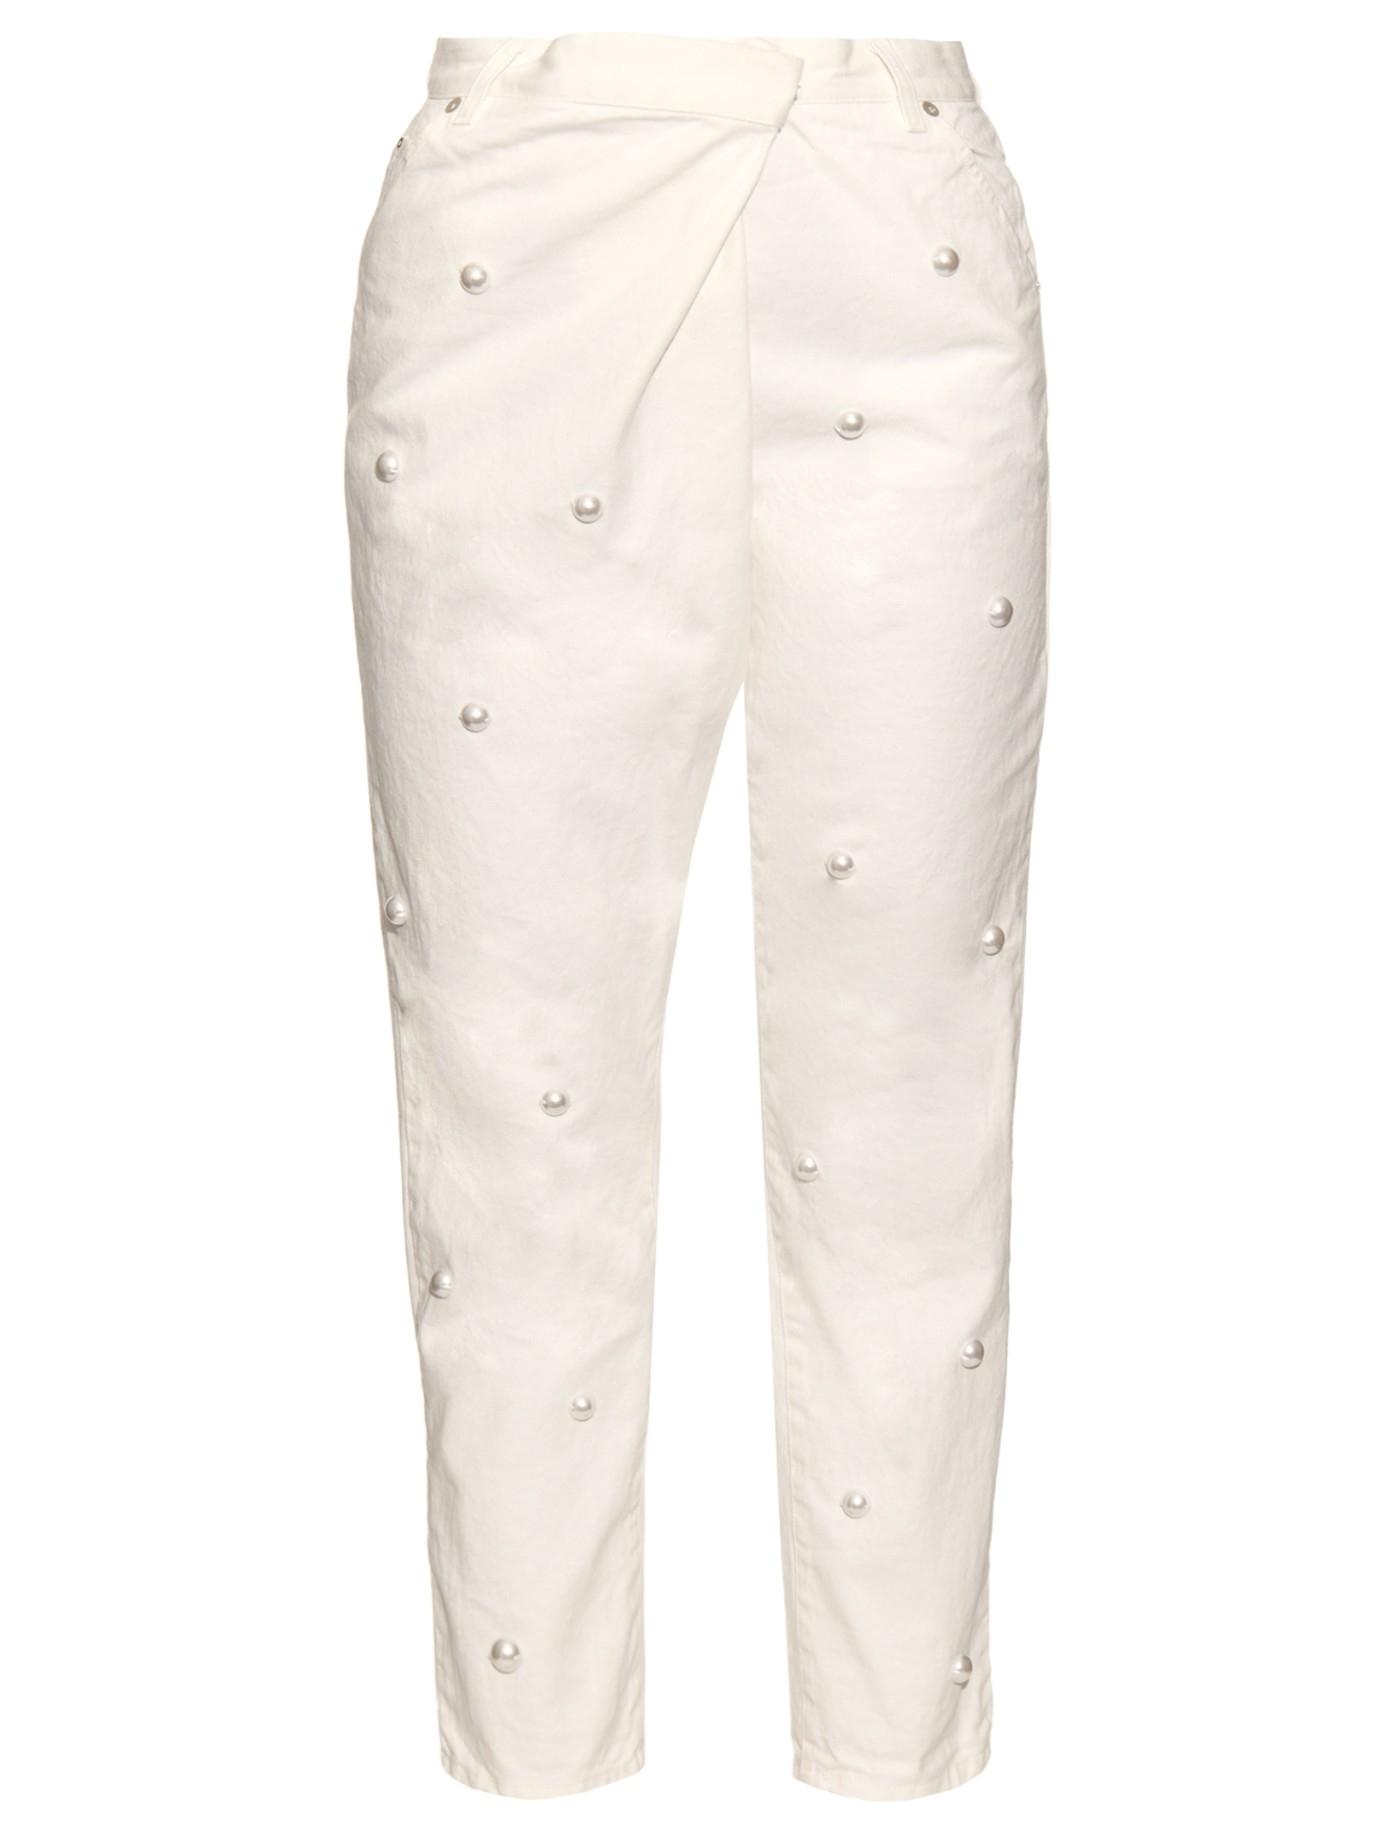 Lyst Muveil Faux Pearl Embellished Boyfriend Jeans In White